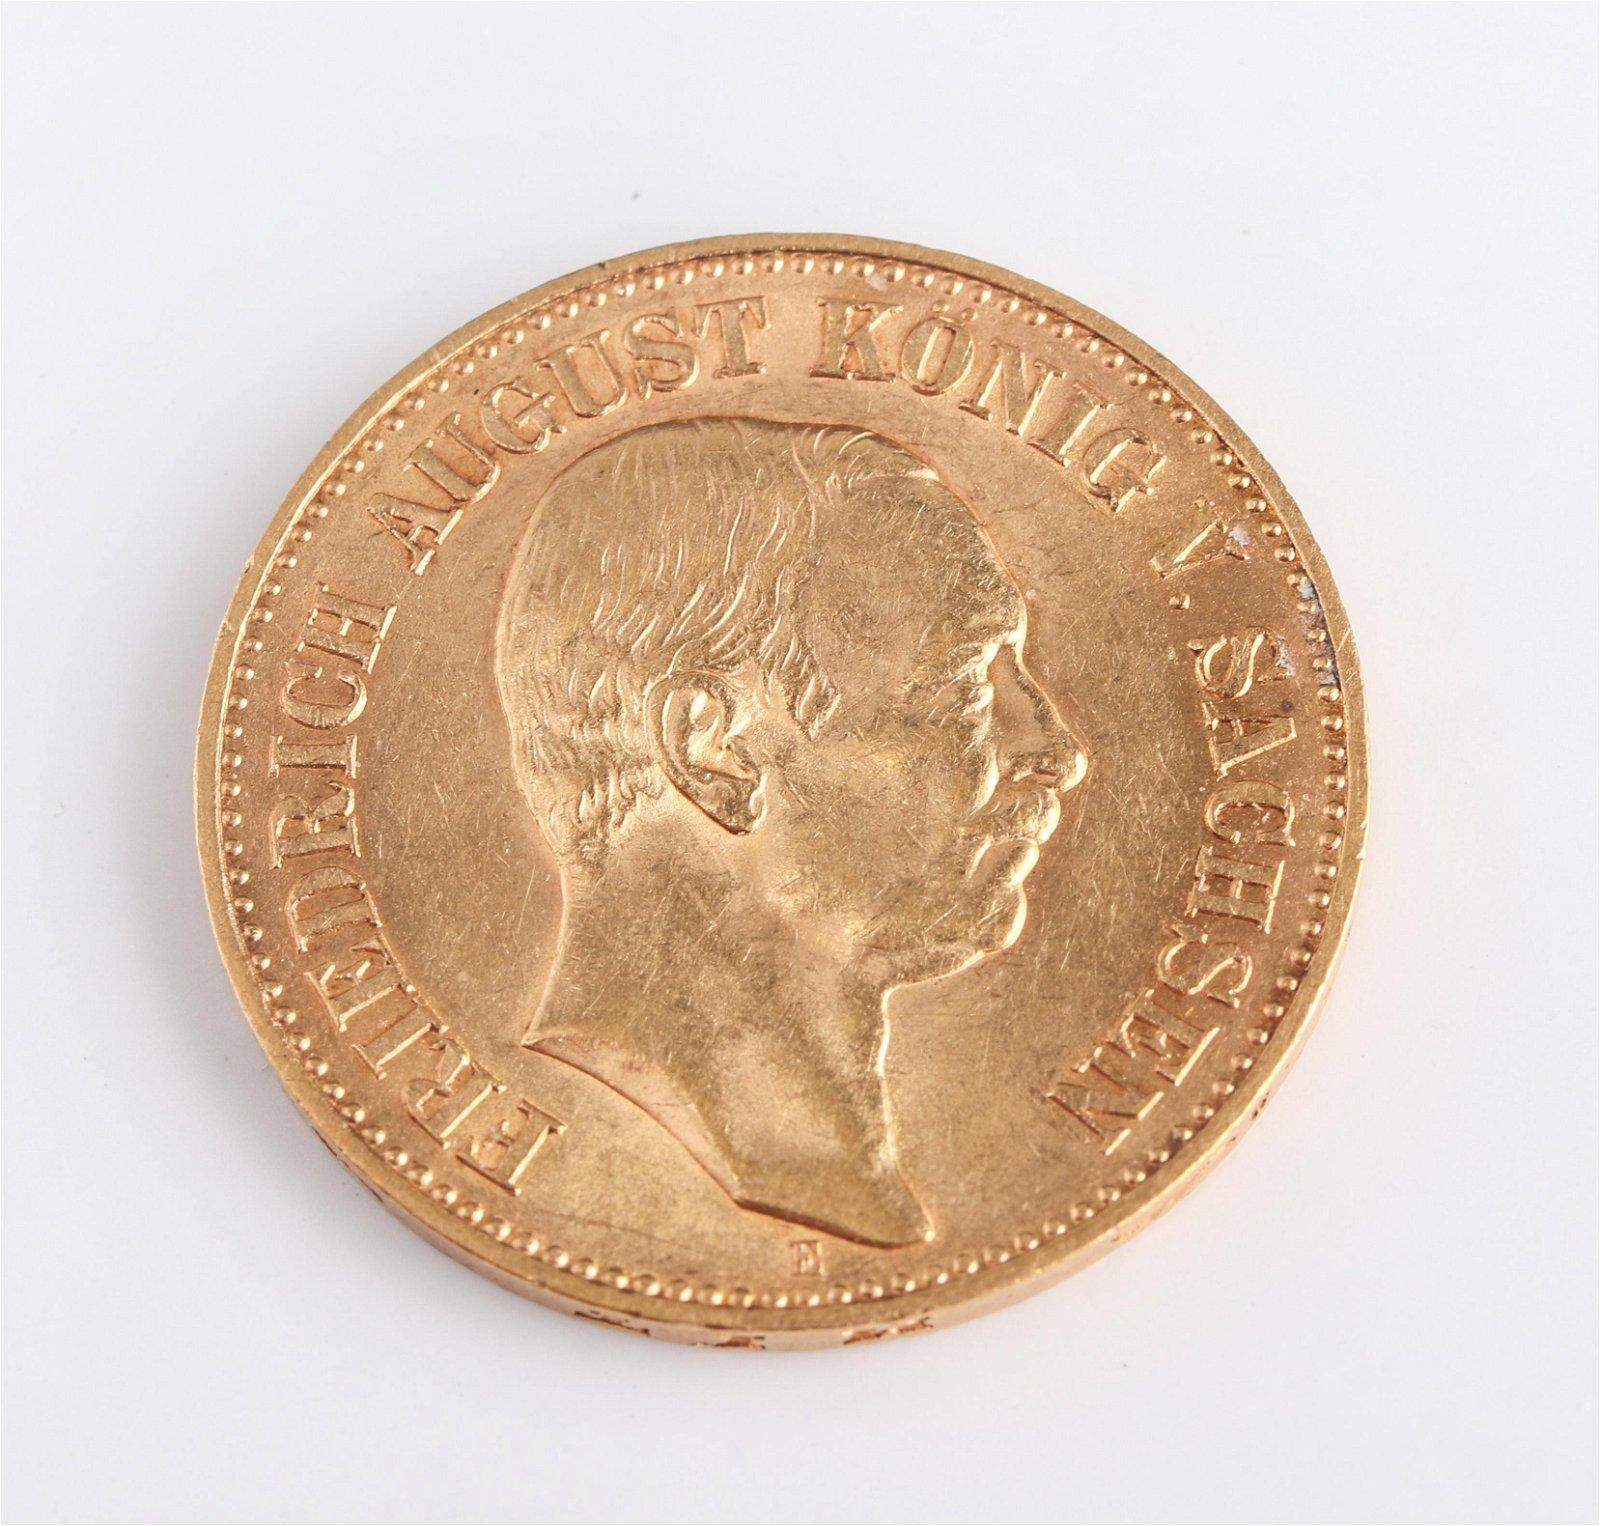 1905 Frederick Augustus 20 Mark Gold Coin